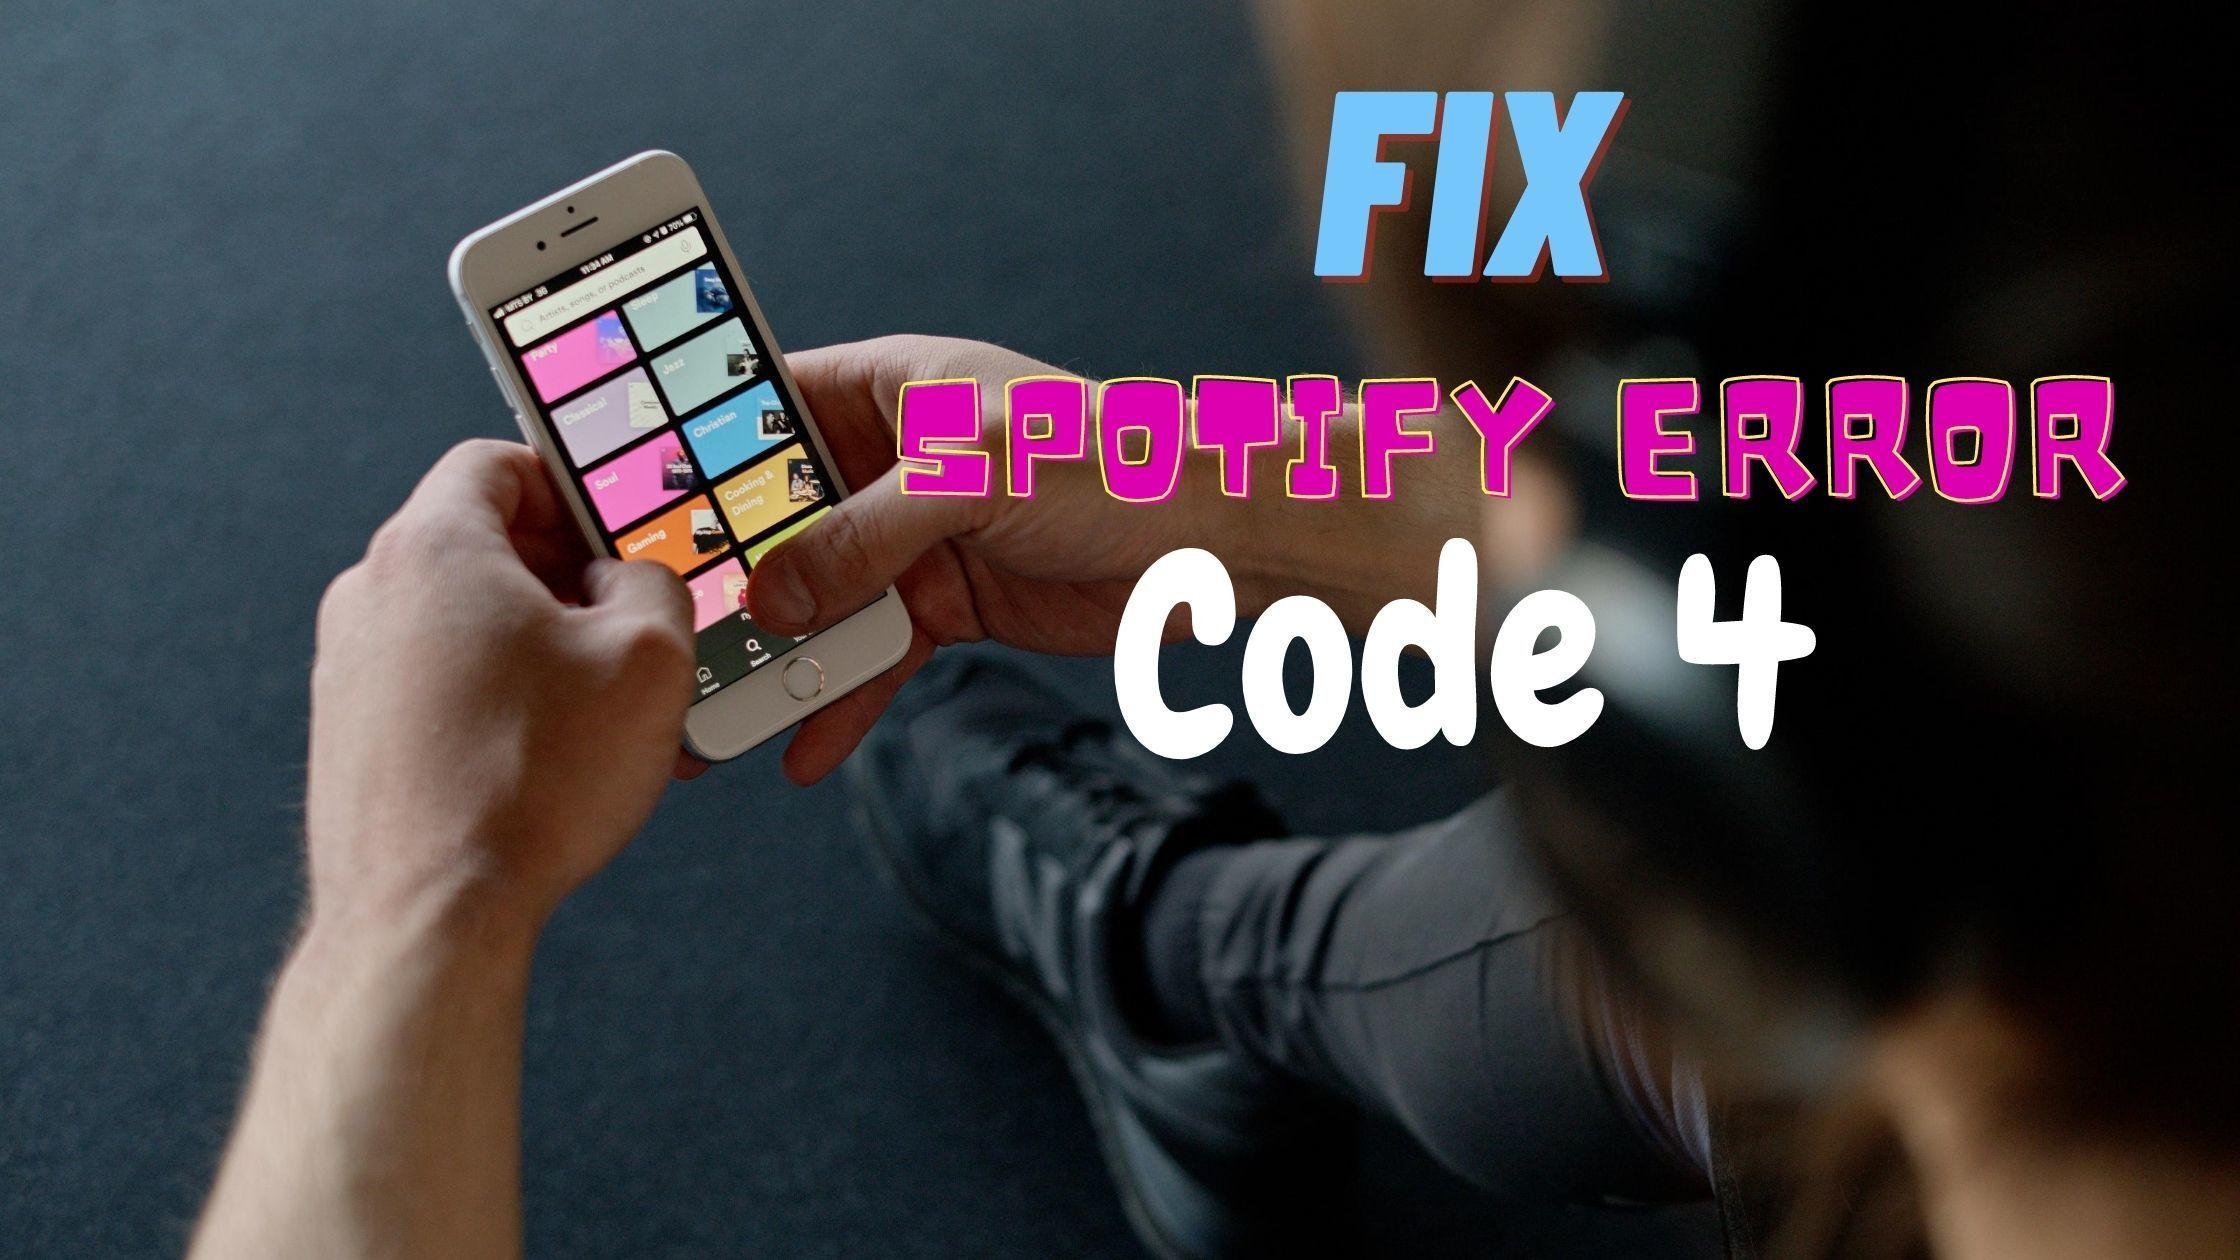 Fix Spotify Error Code 4: No Internet connection